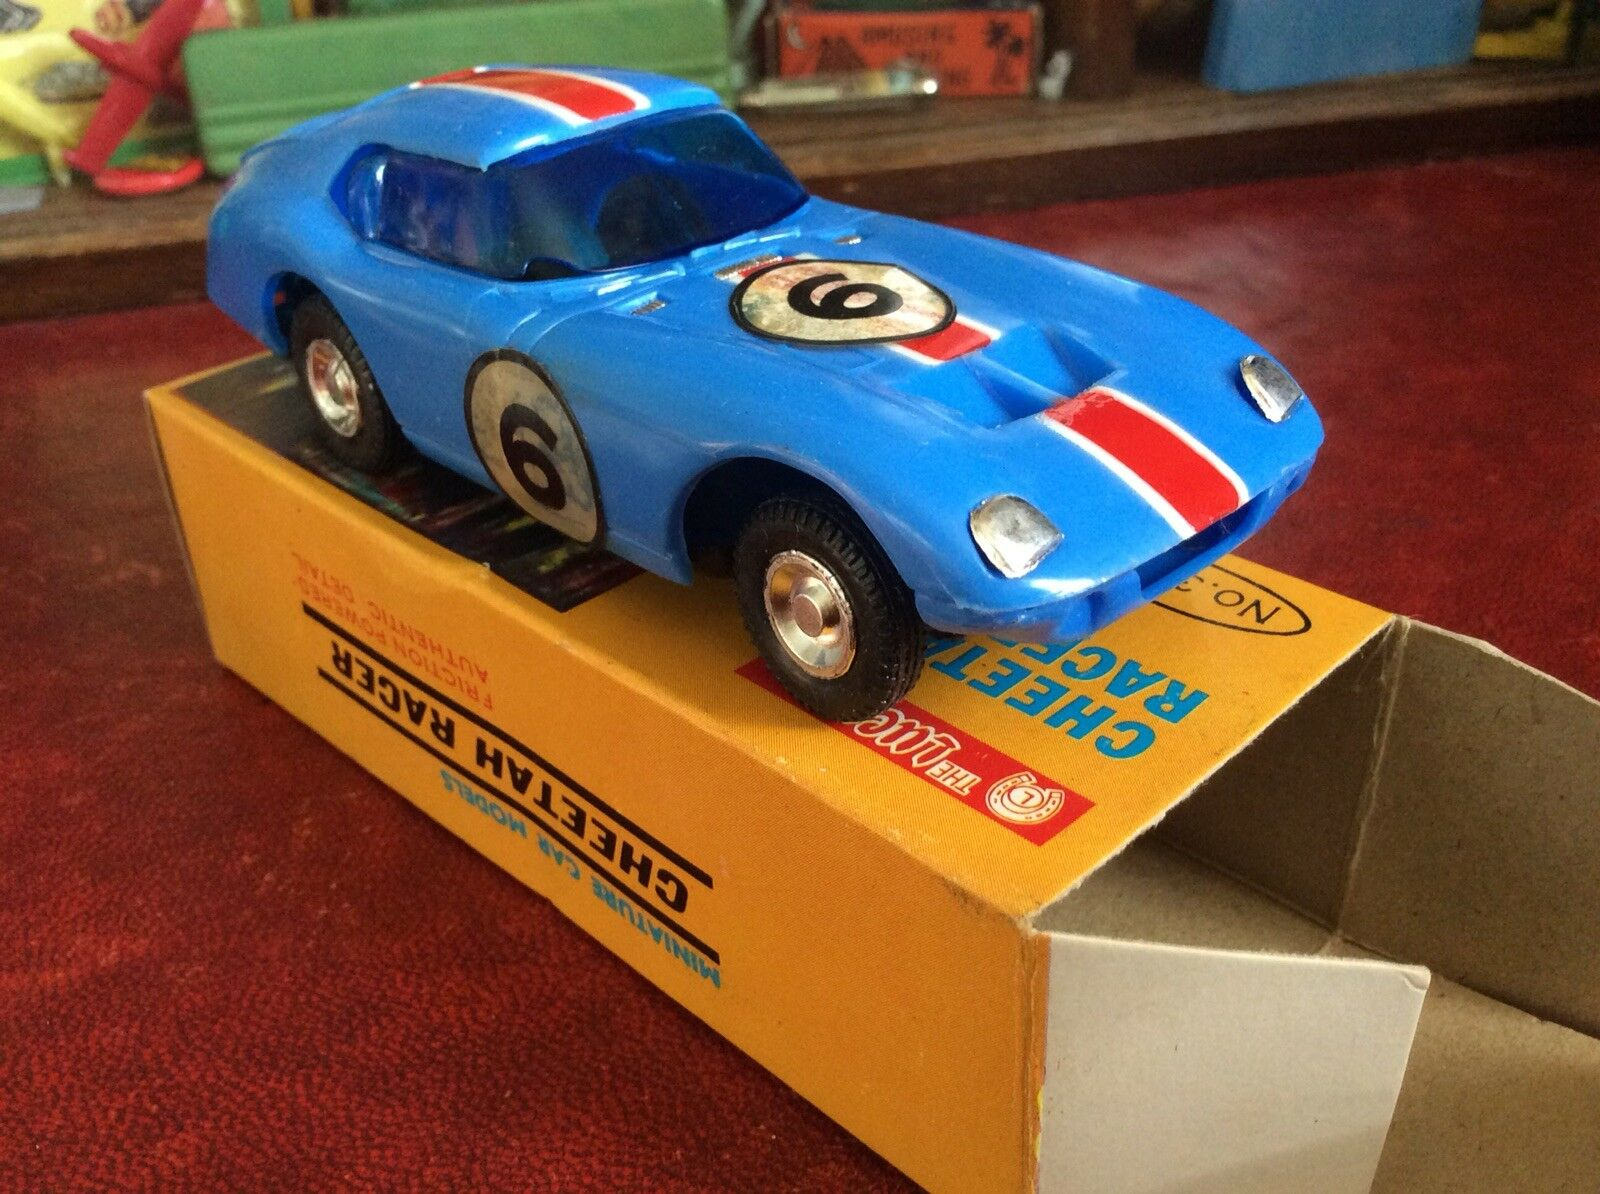 1960-talet Plastic Cheetah Racer Car Cw Box Excellent Lucky leksaks Hong Kong